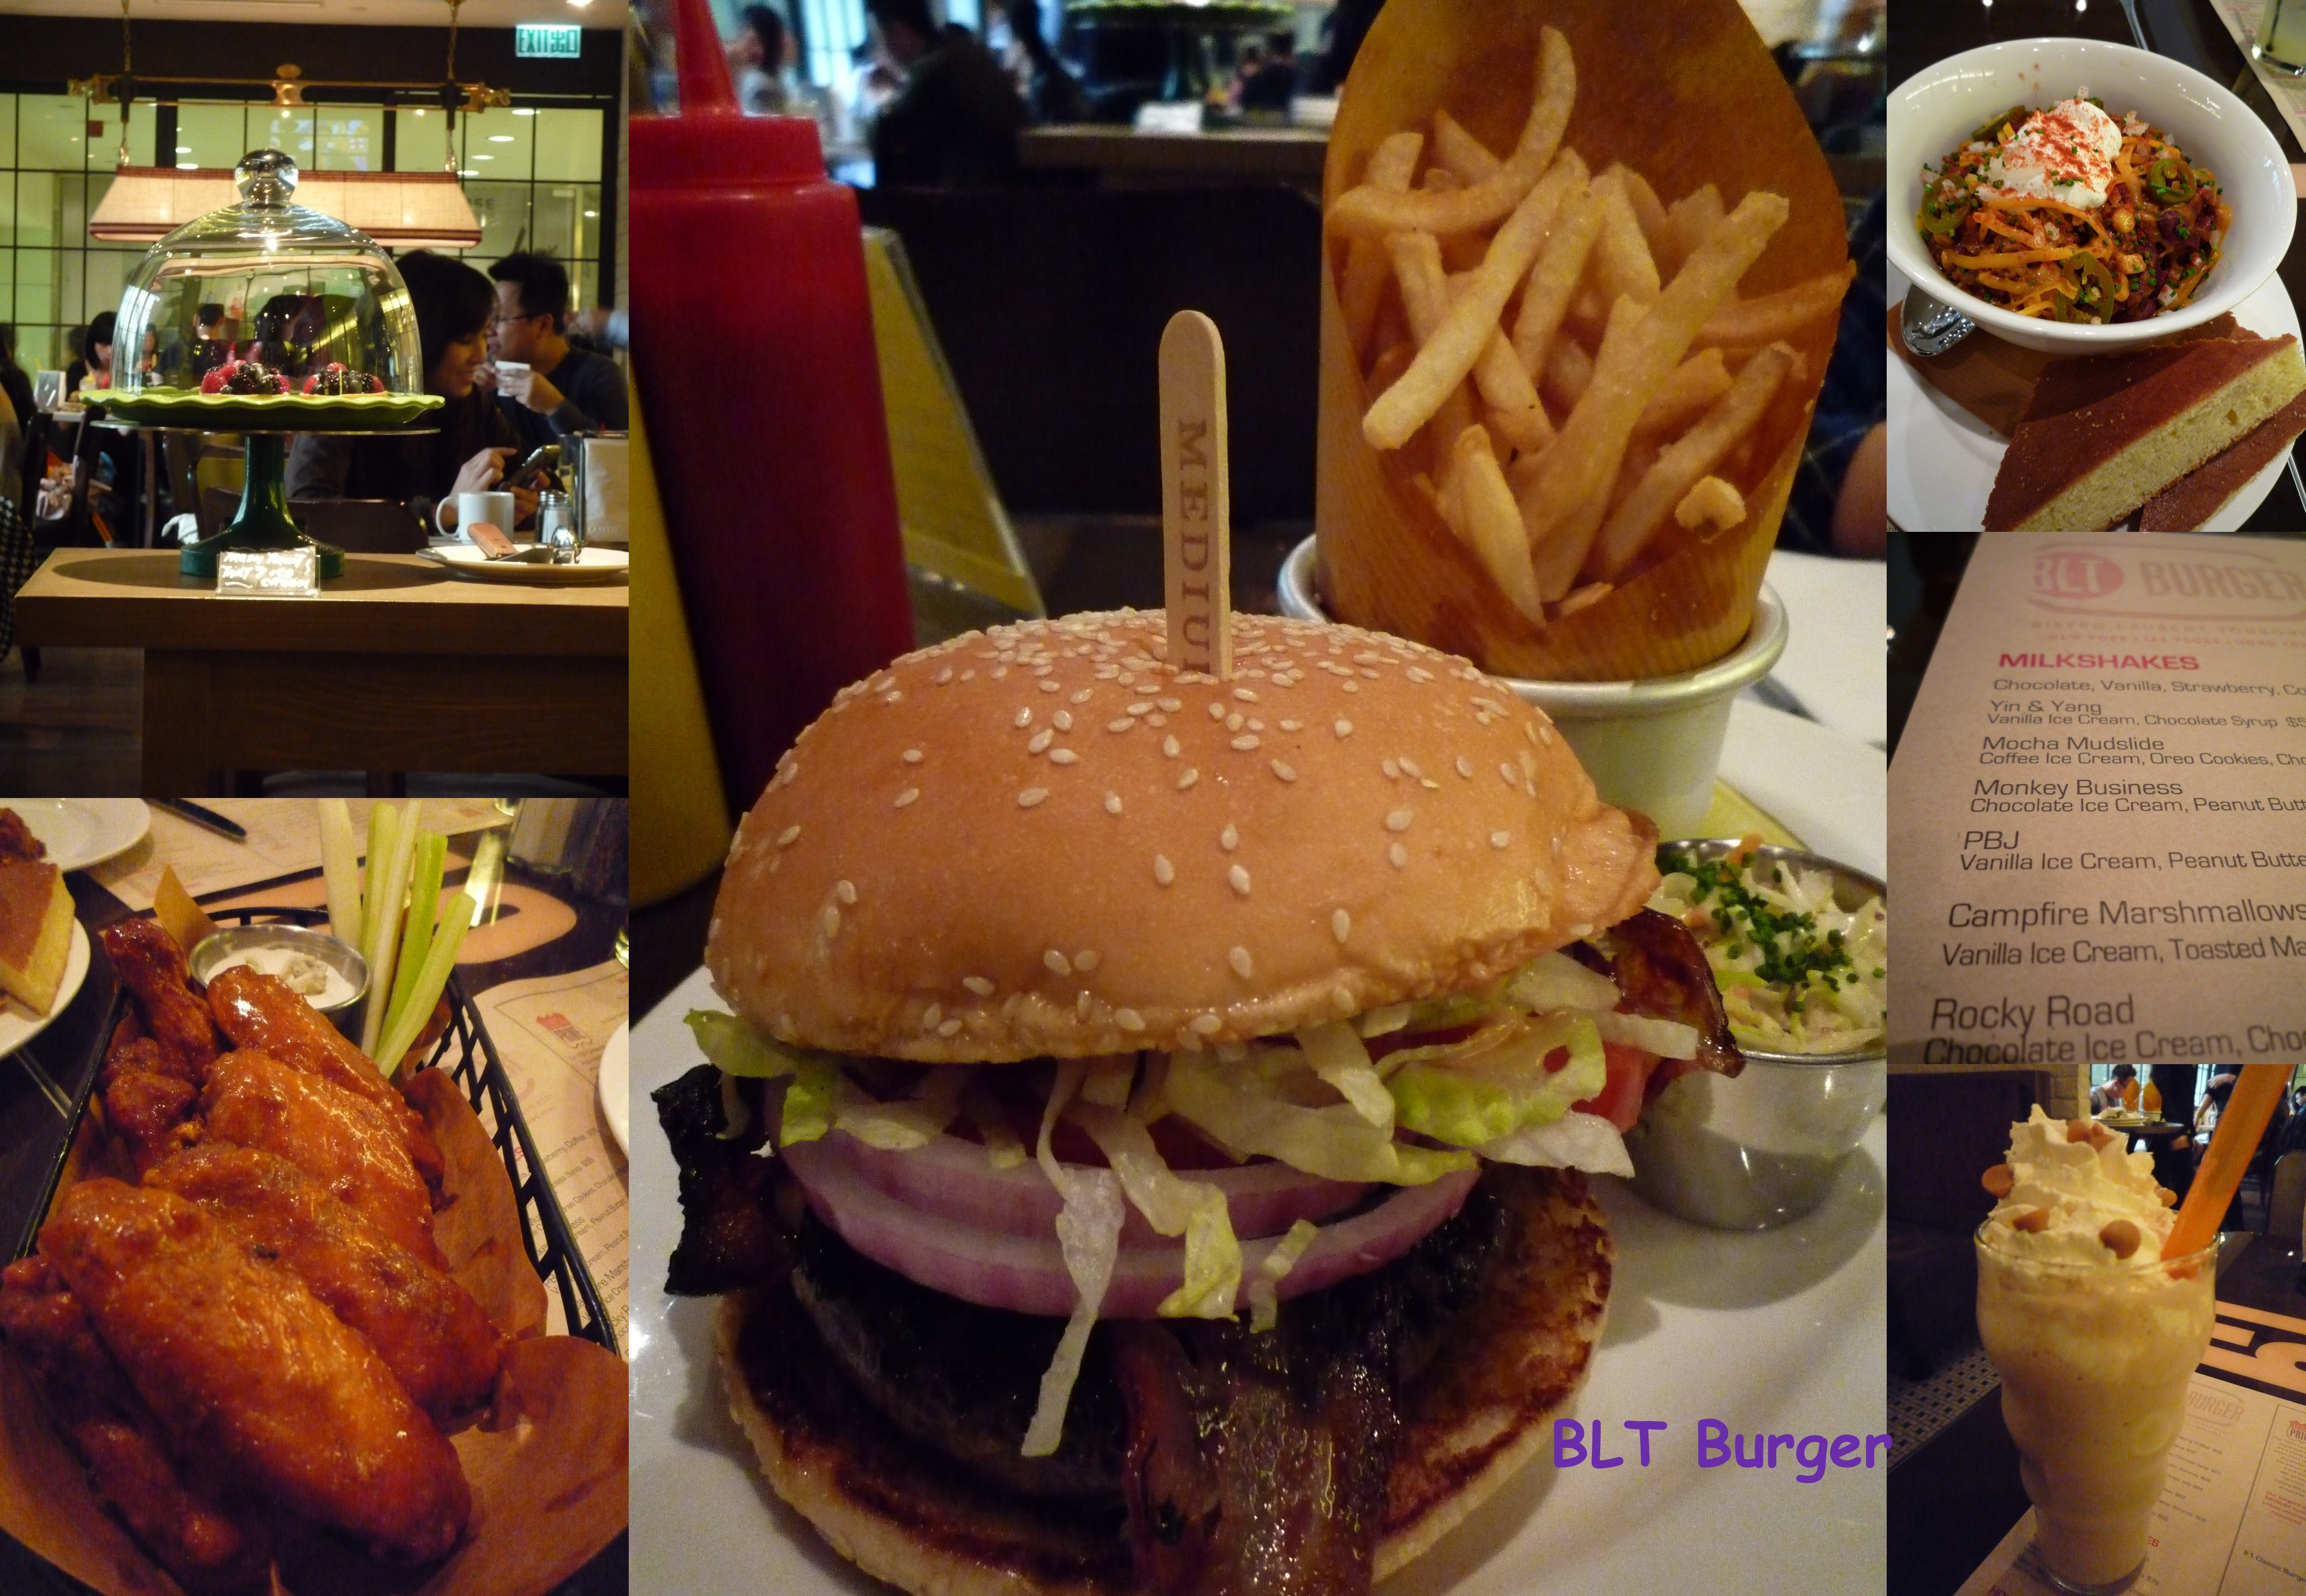 BLT Burger & Bistecca_d0088196_19565362.jpg